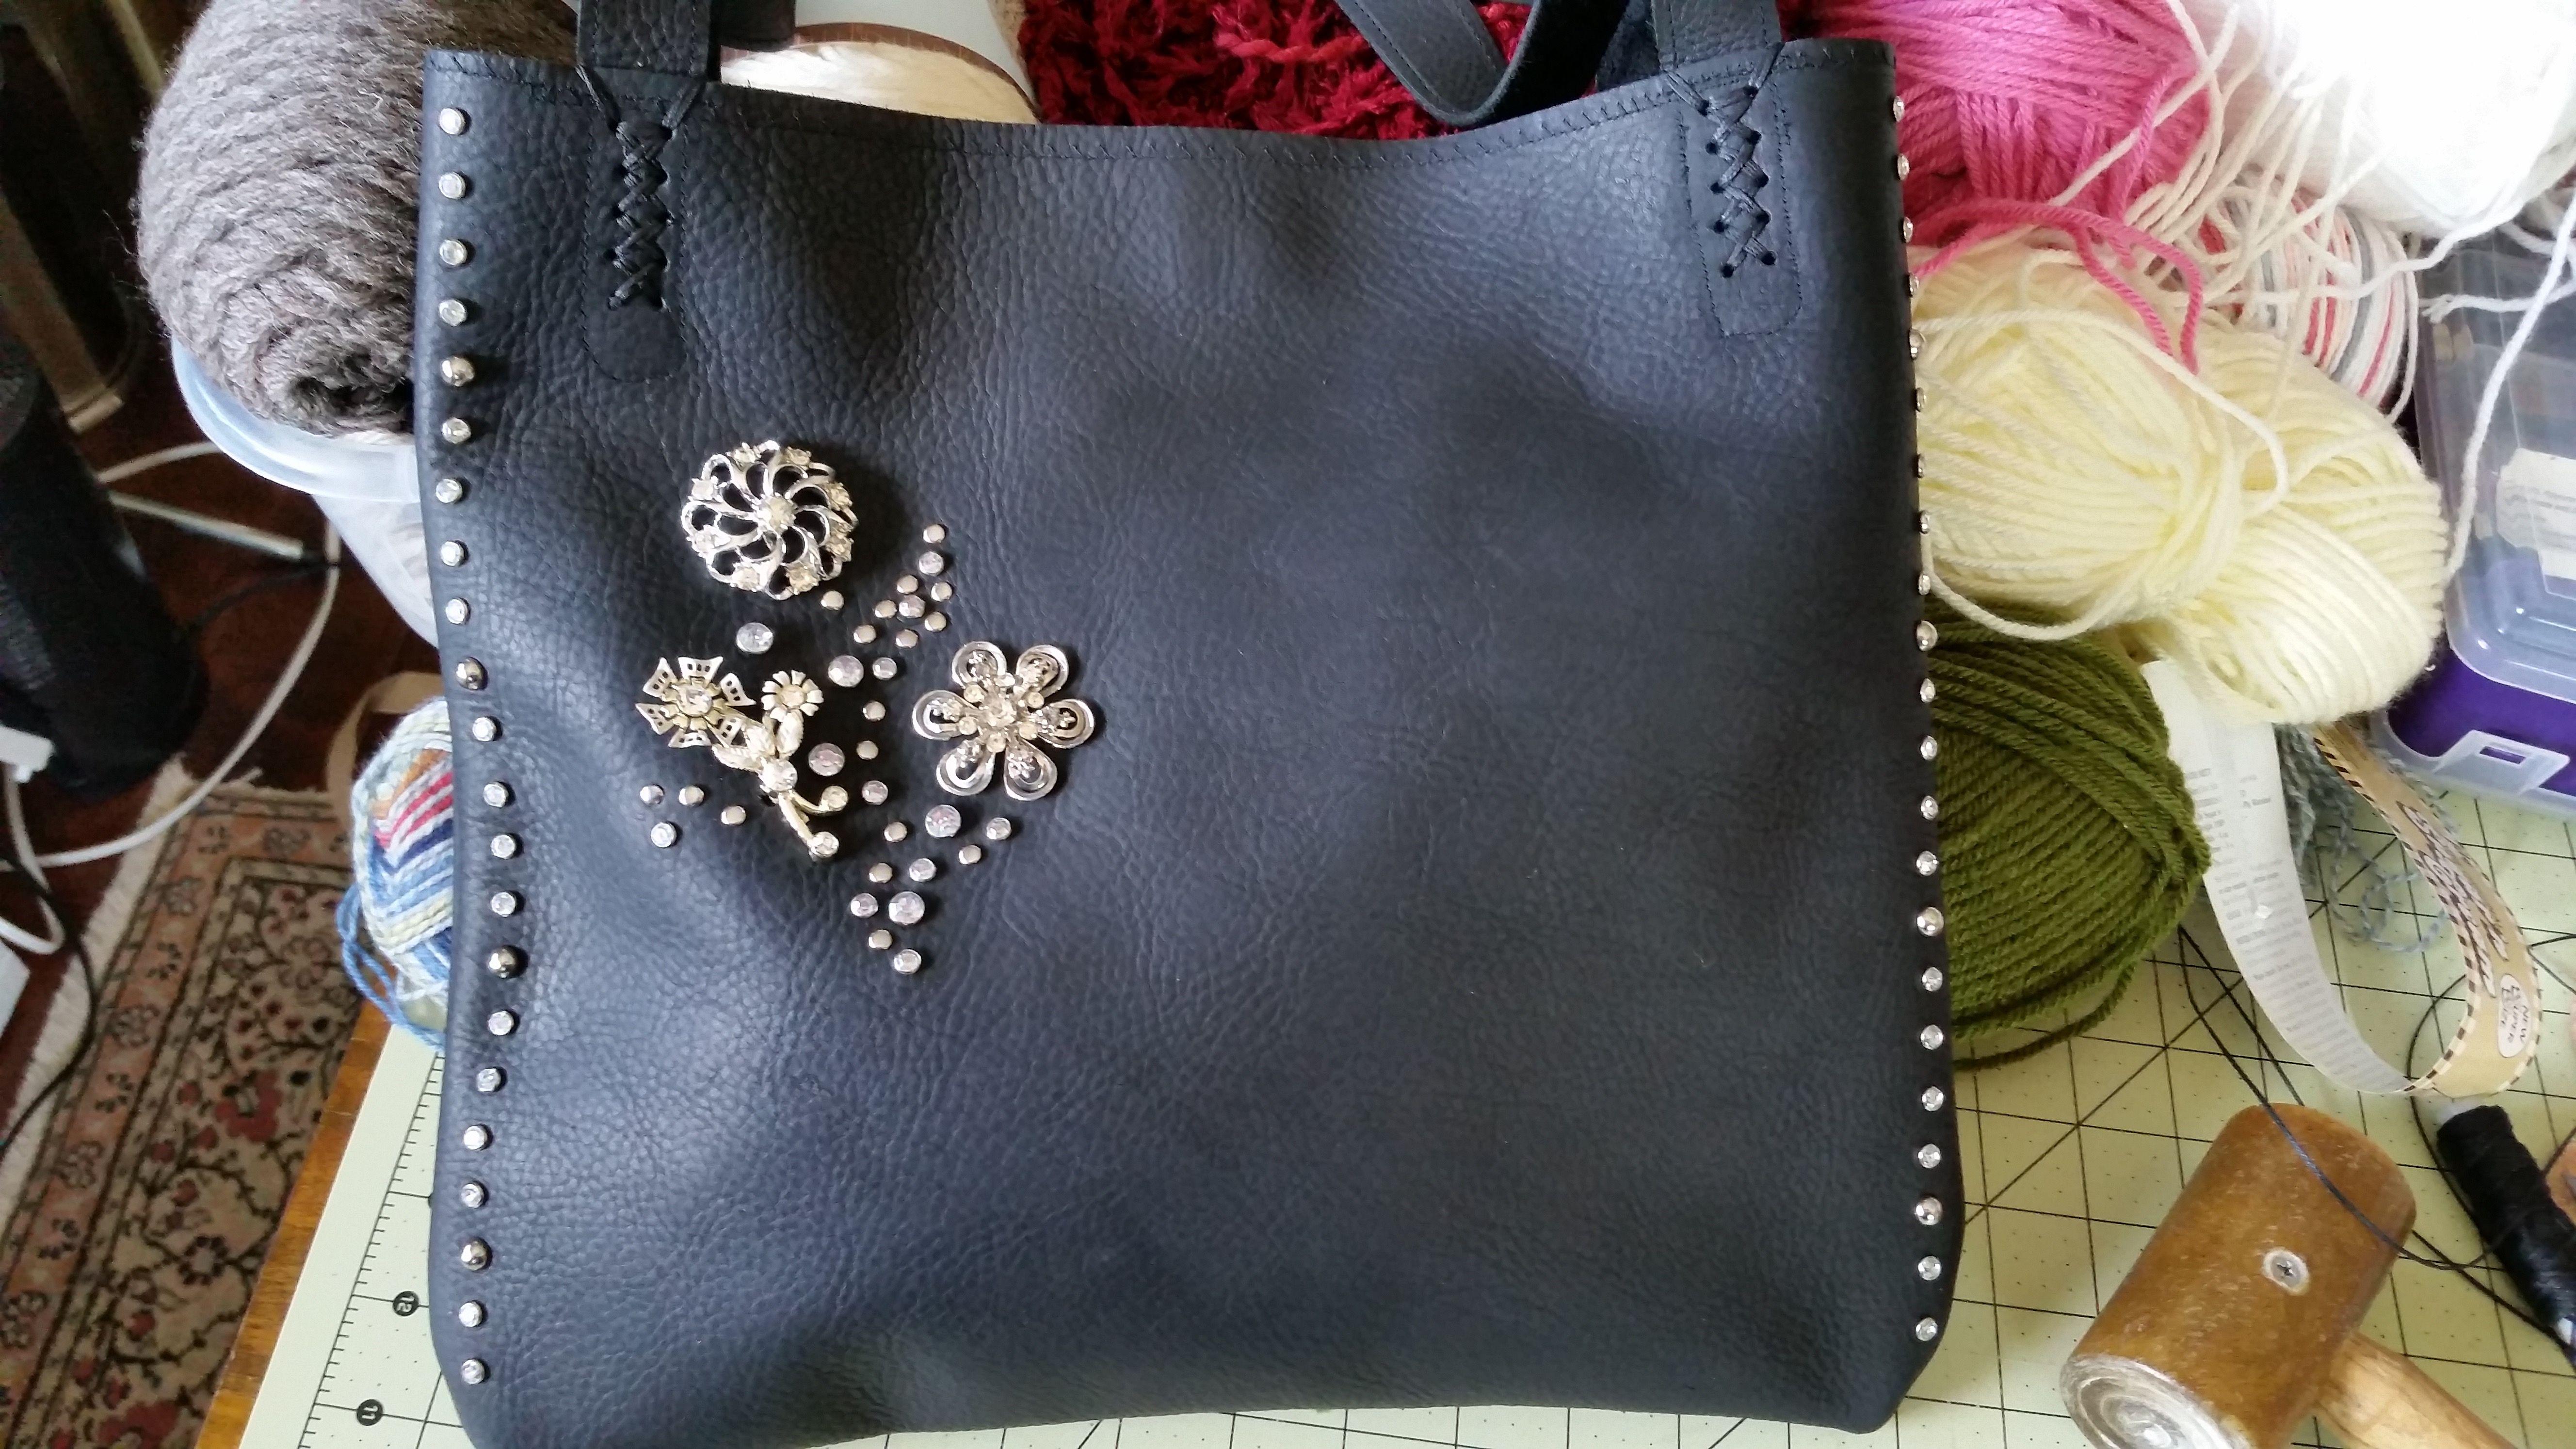 Custom Made Black Kodiak Leather lined computer bag - Love this bag!